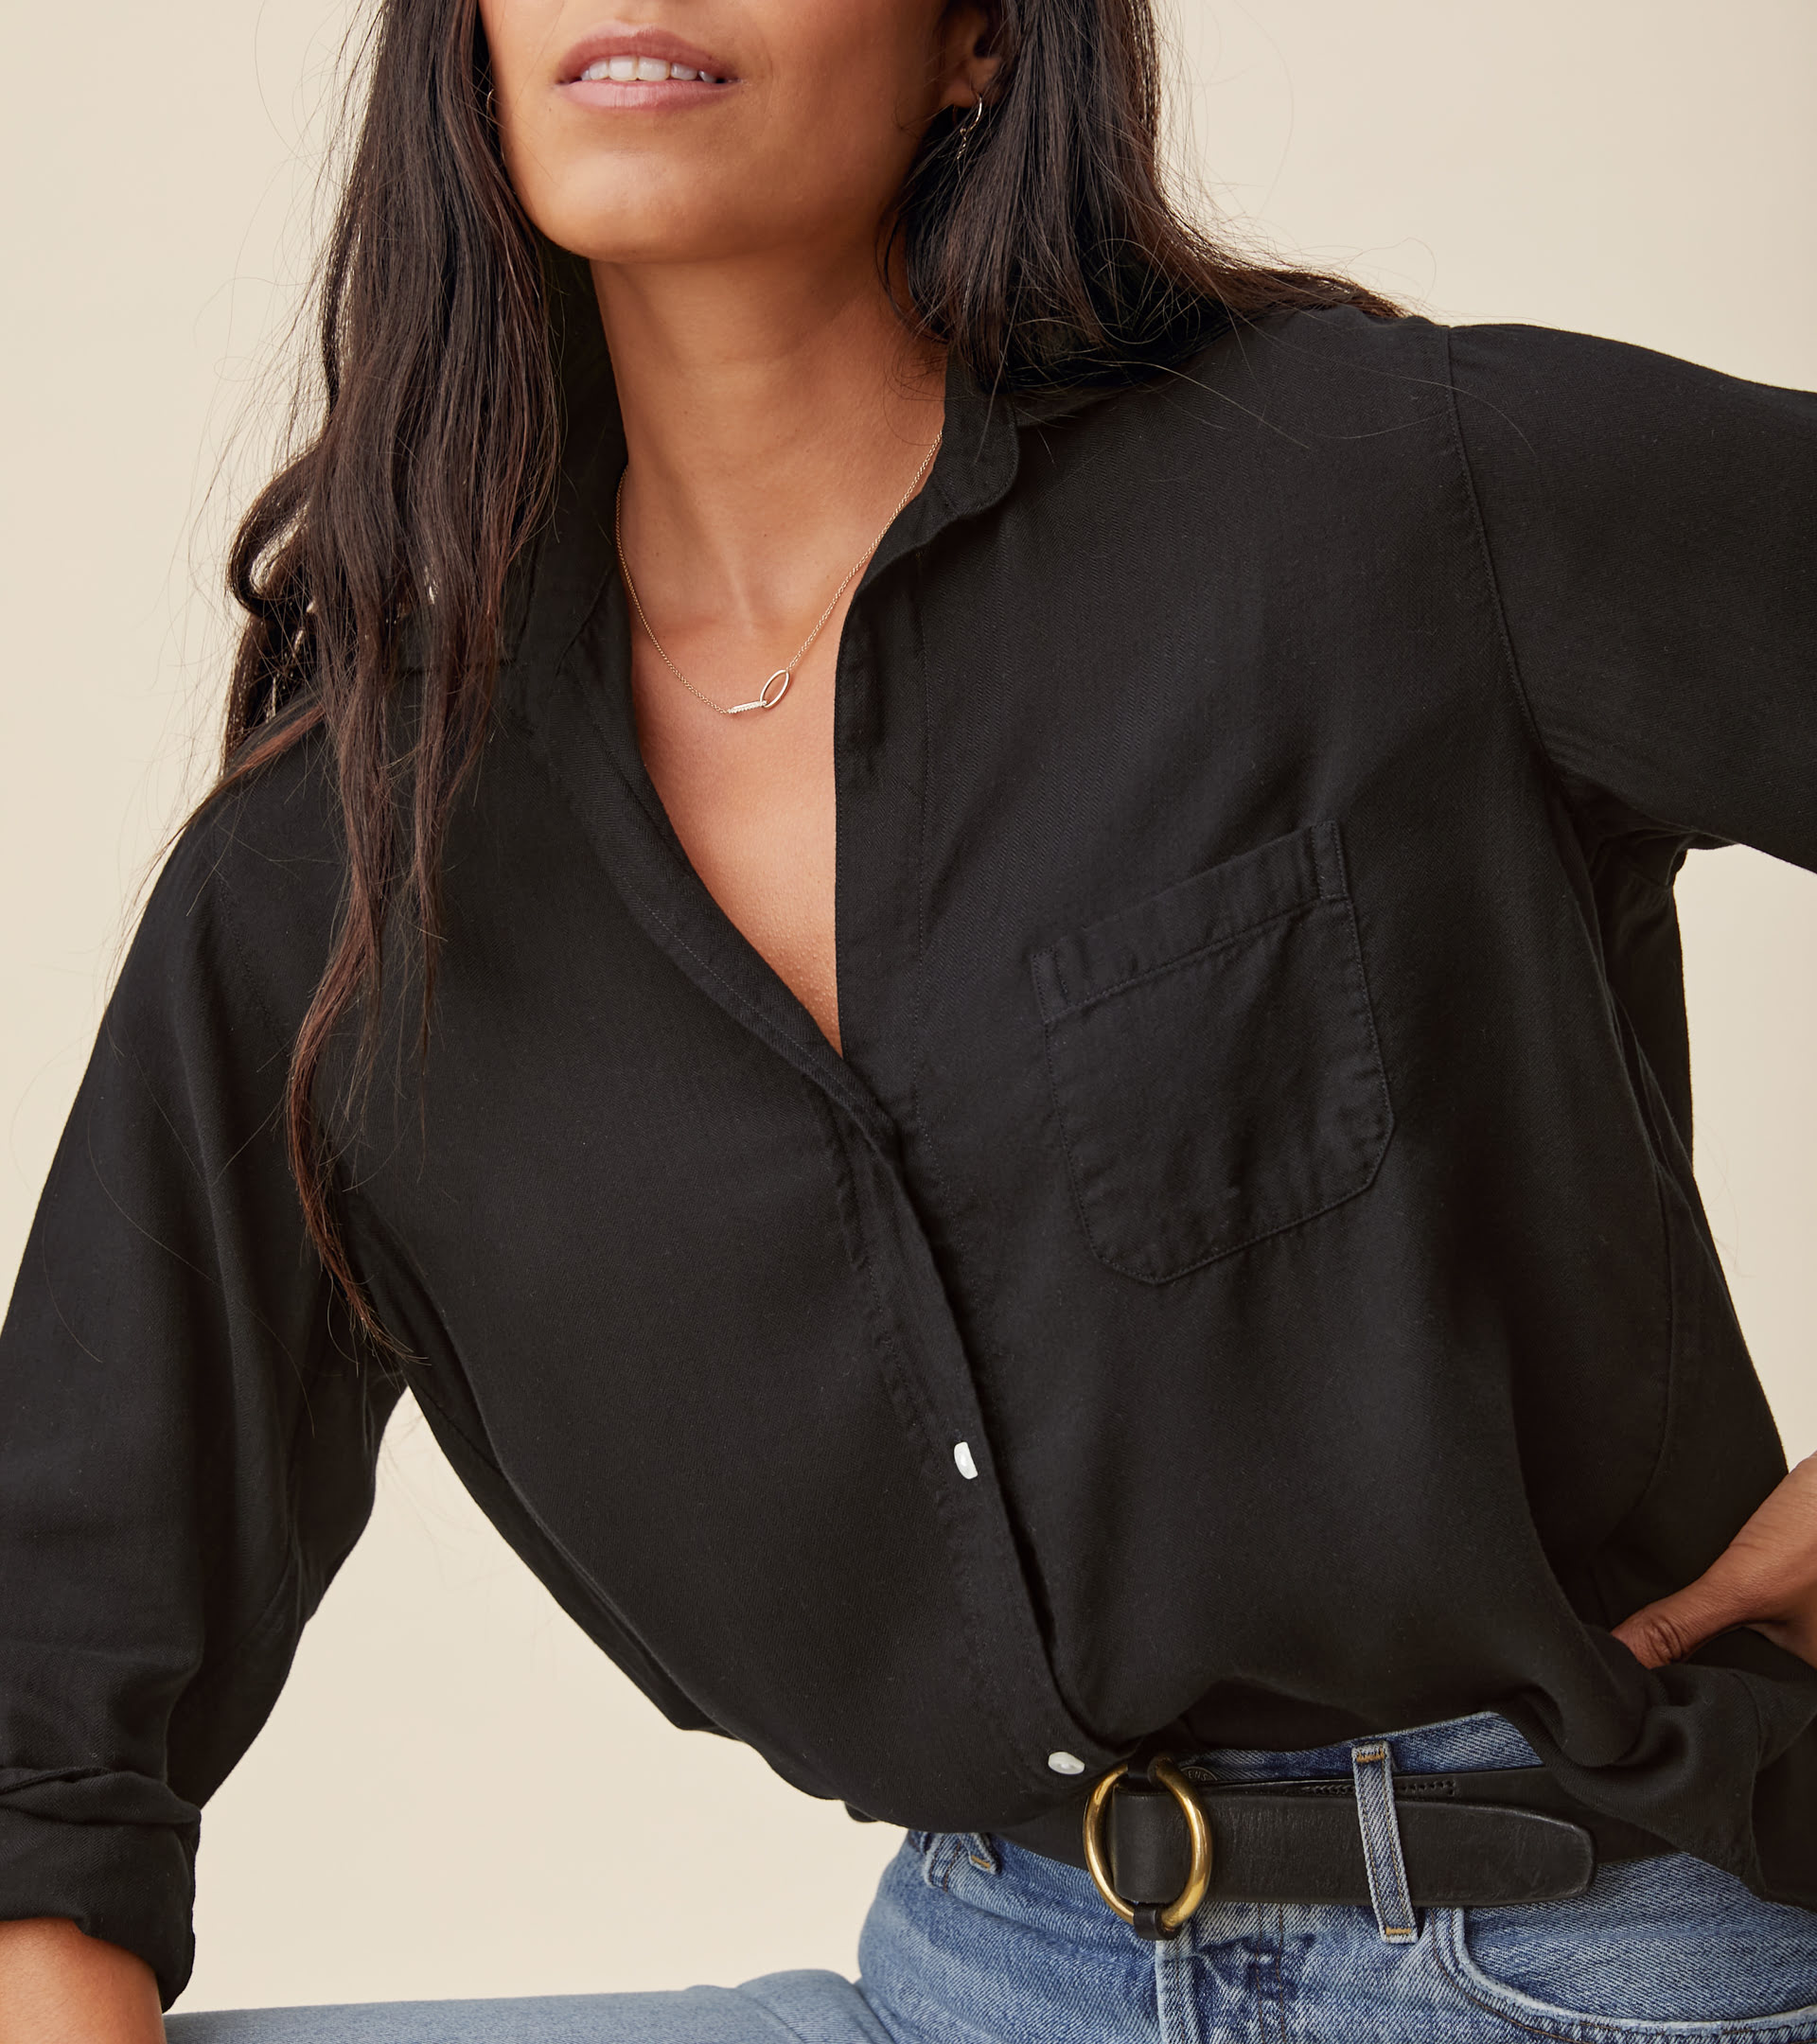 The Hero Button-Up Shirt Black, Liquid Flannel view 2